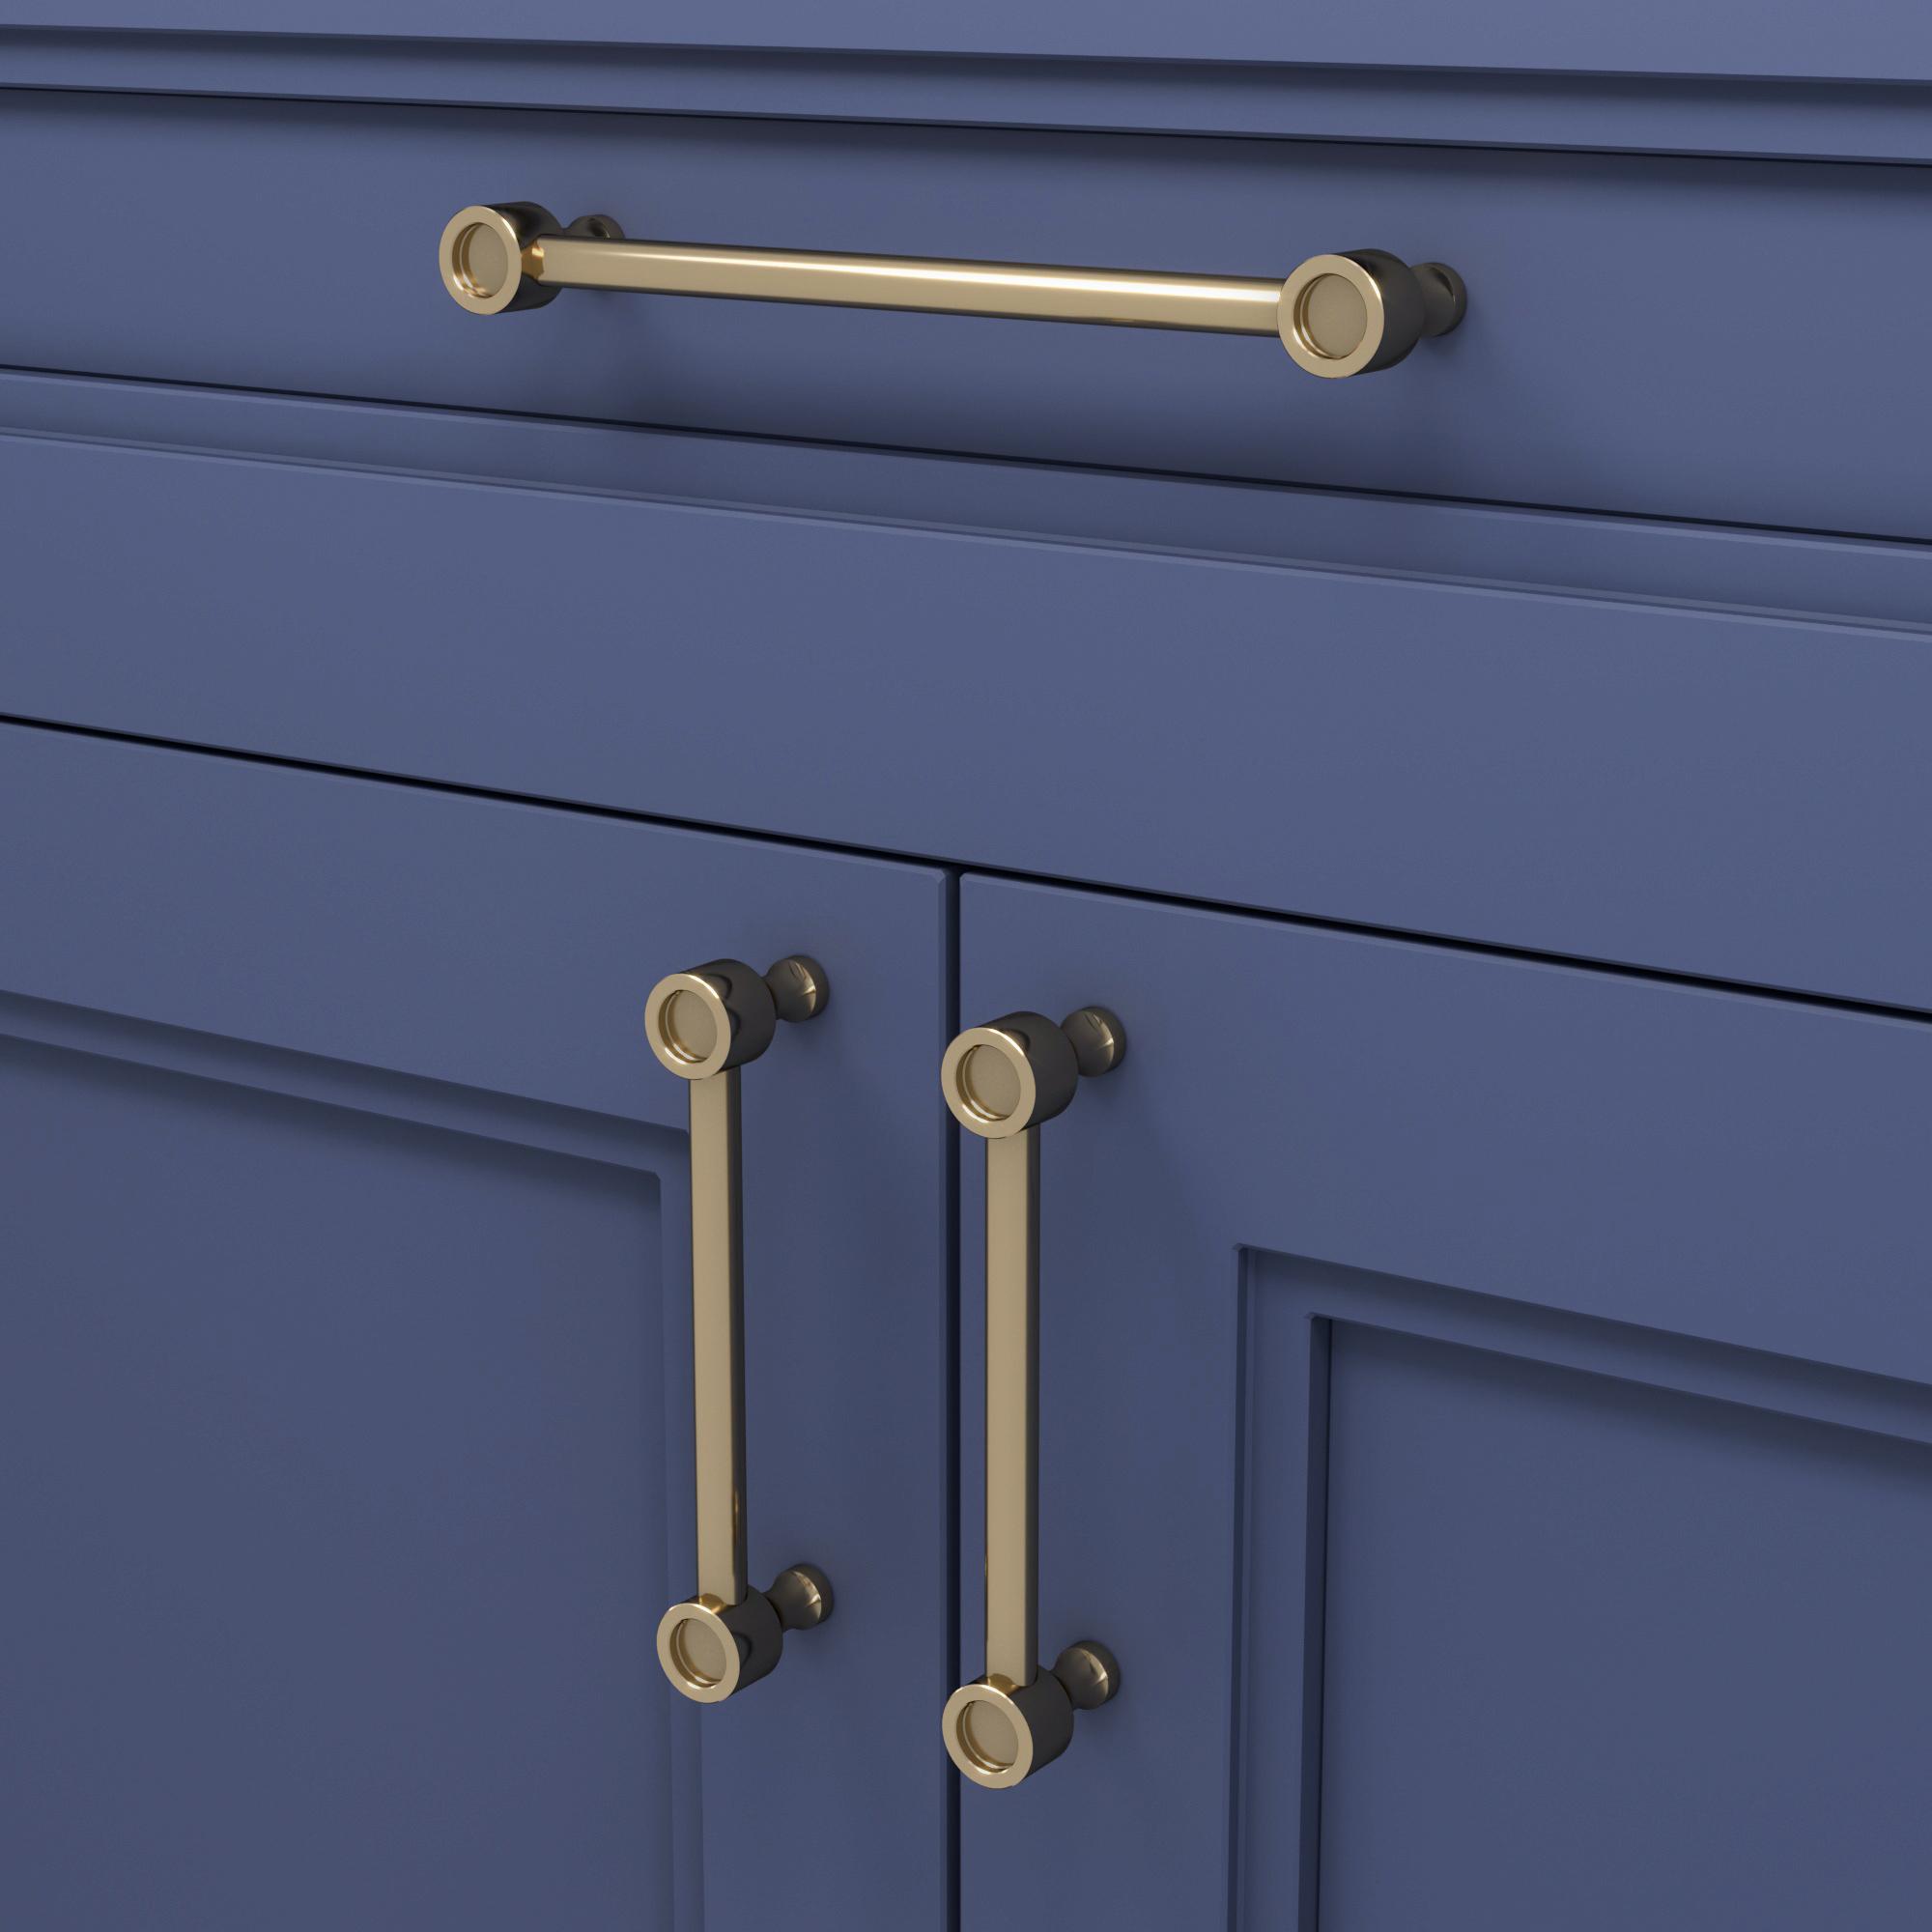 Скоба Snowdrop / Polished Lacquered Brass